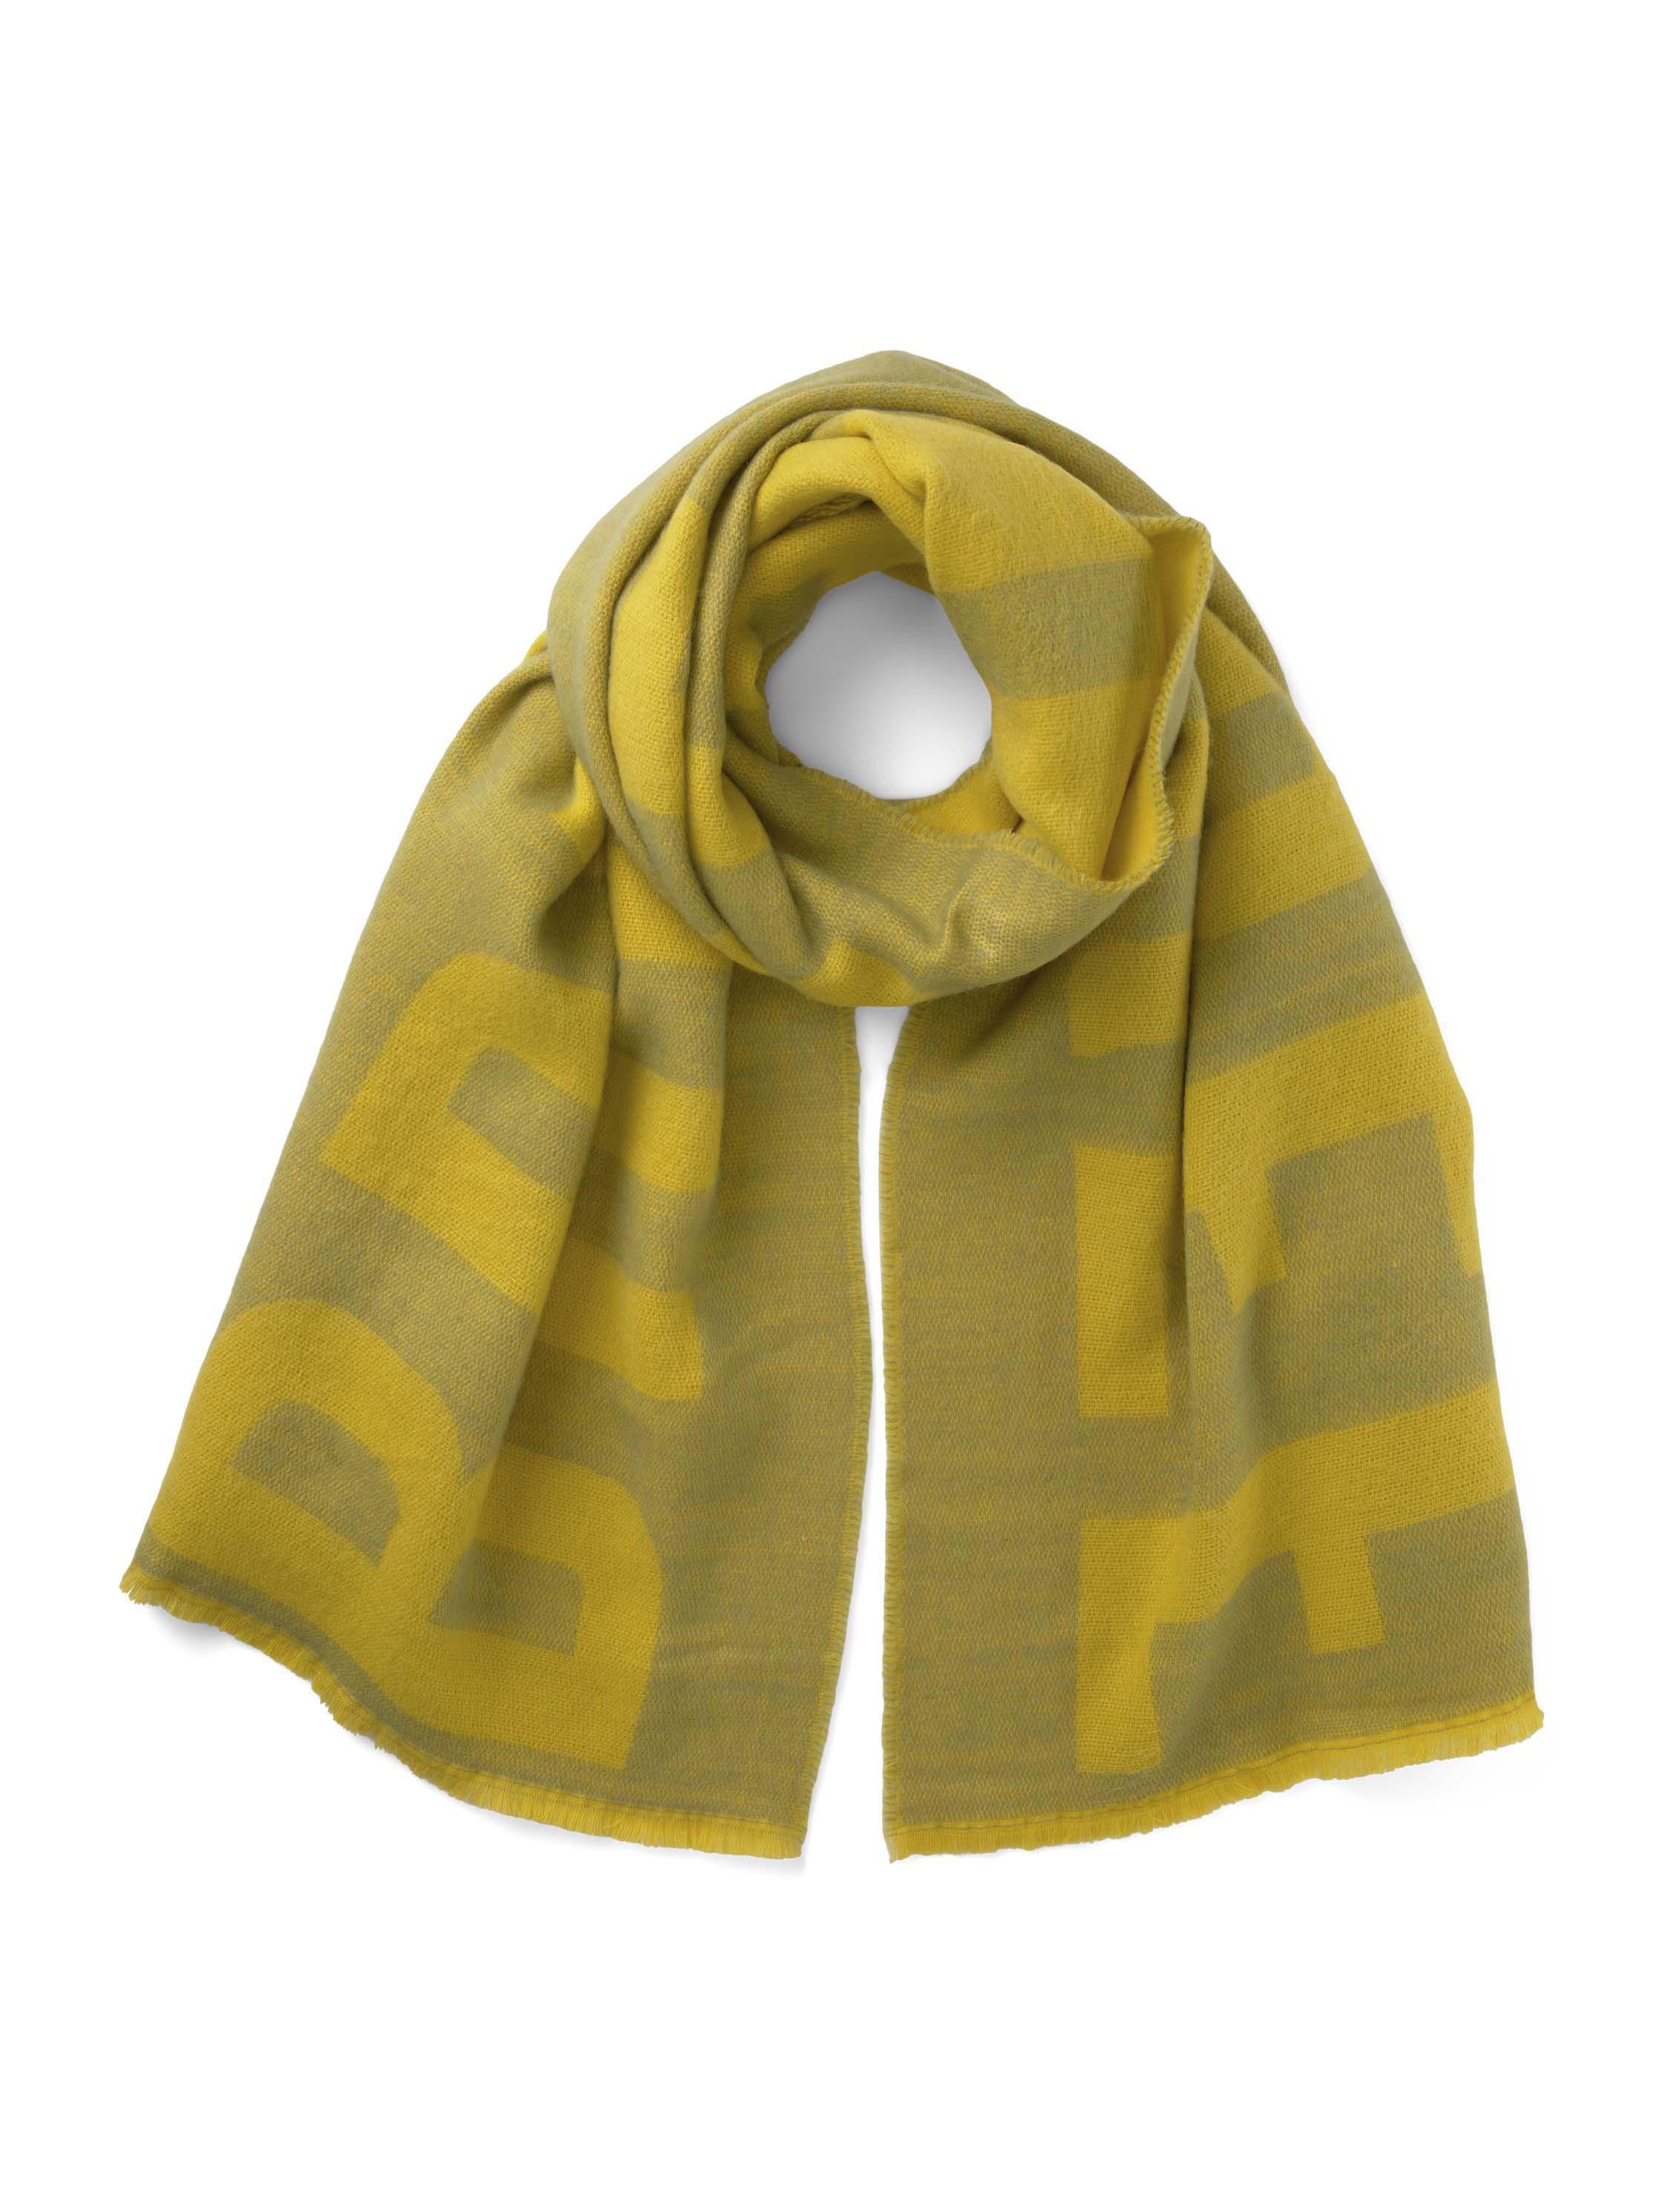 cozy scarf with wording, greyish green